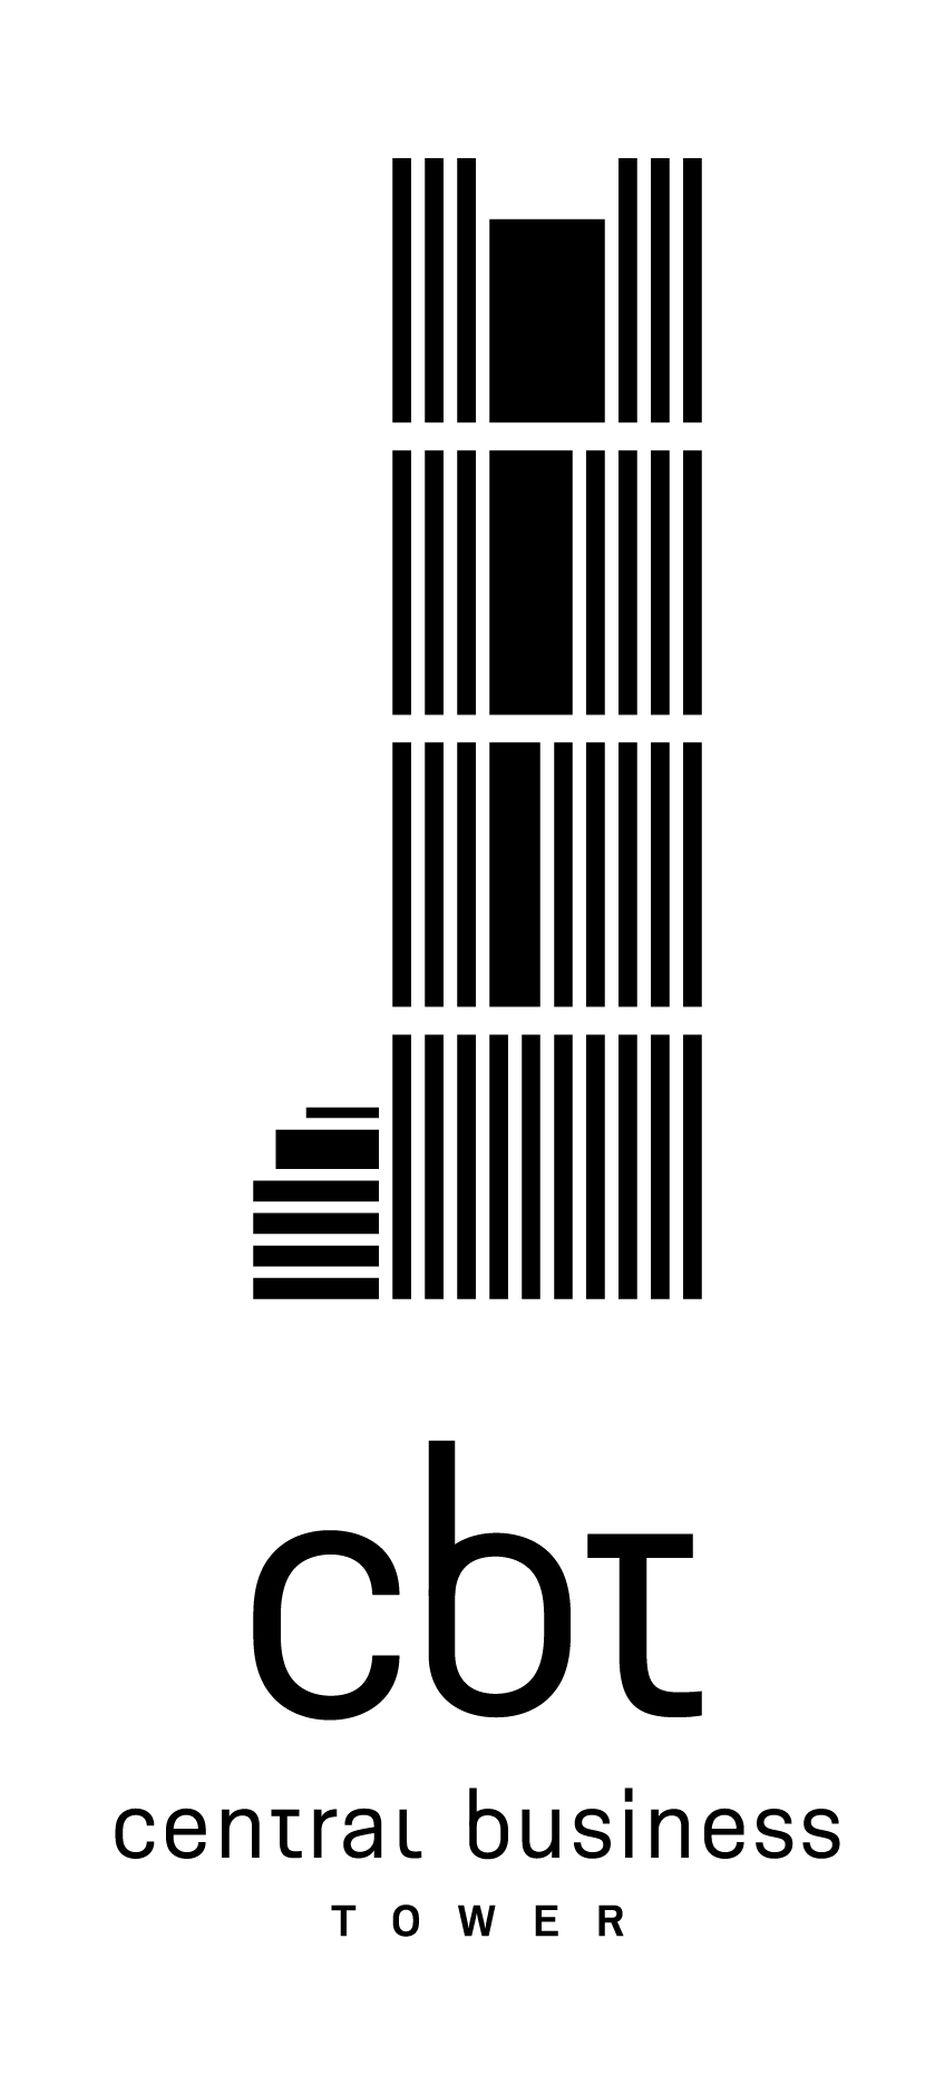 Bild: https://register.dpma.de/DPMAregister/marke/de/images//ed/cb/3f7a0cd235353be3c078ab97a006261220b4.jpg